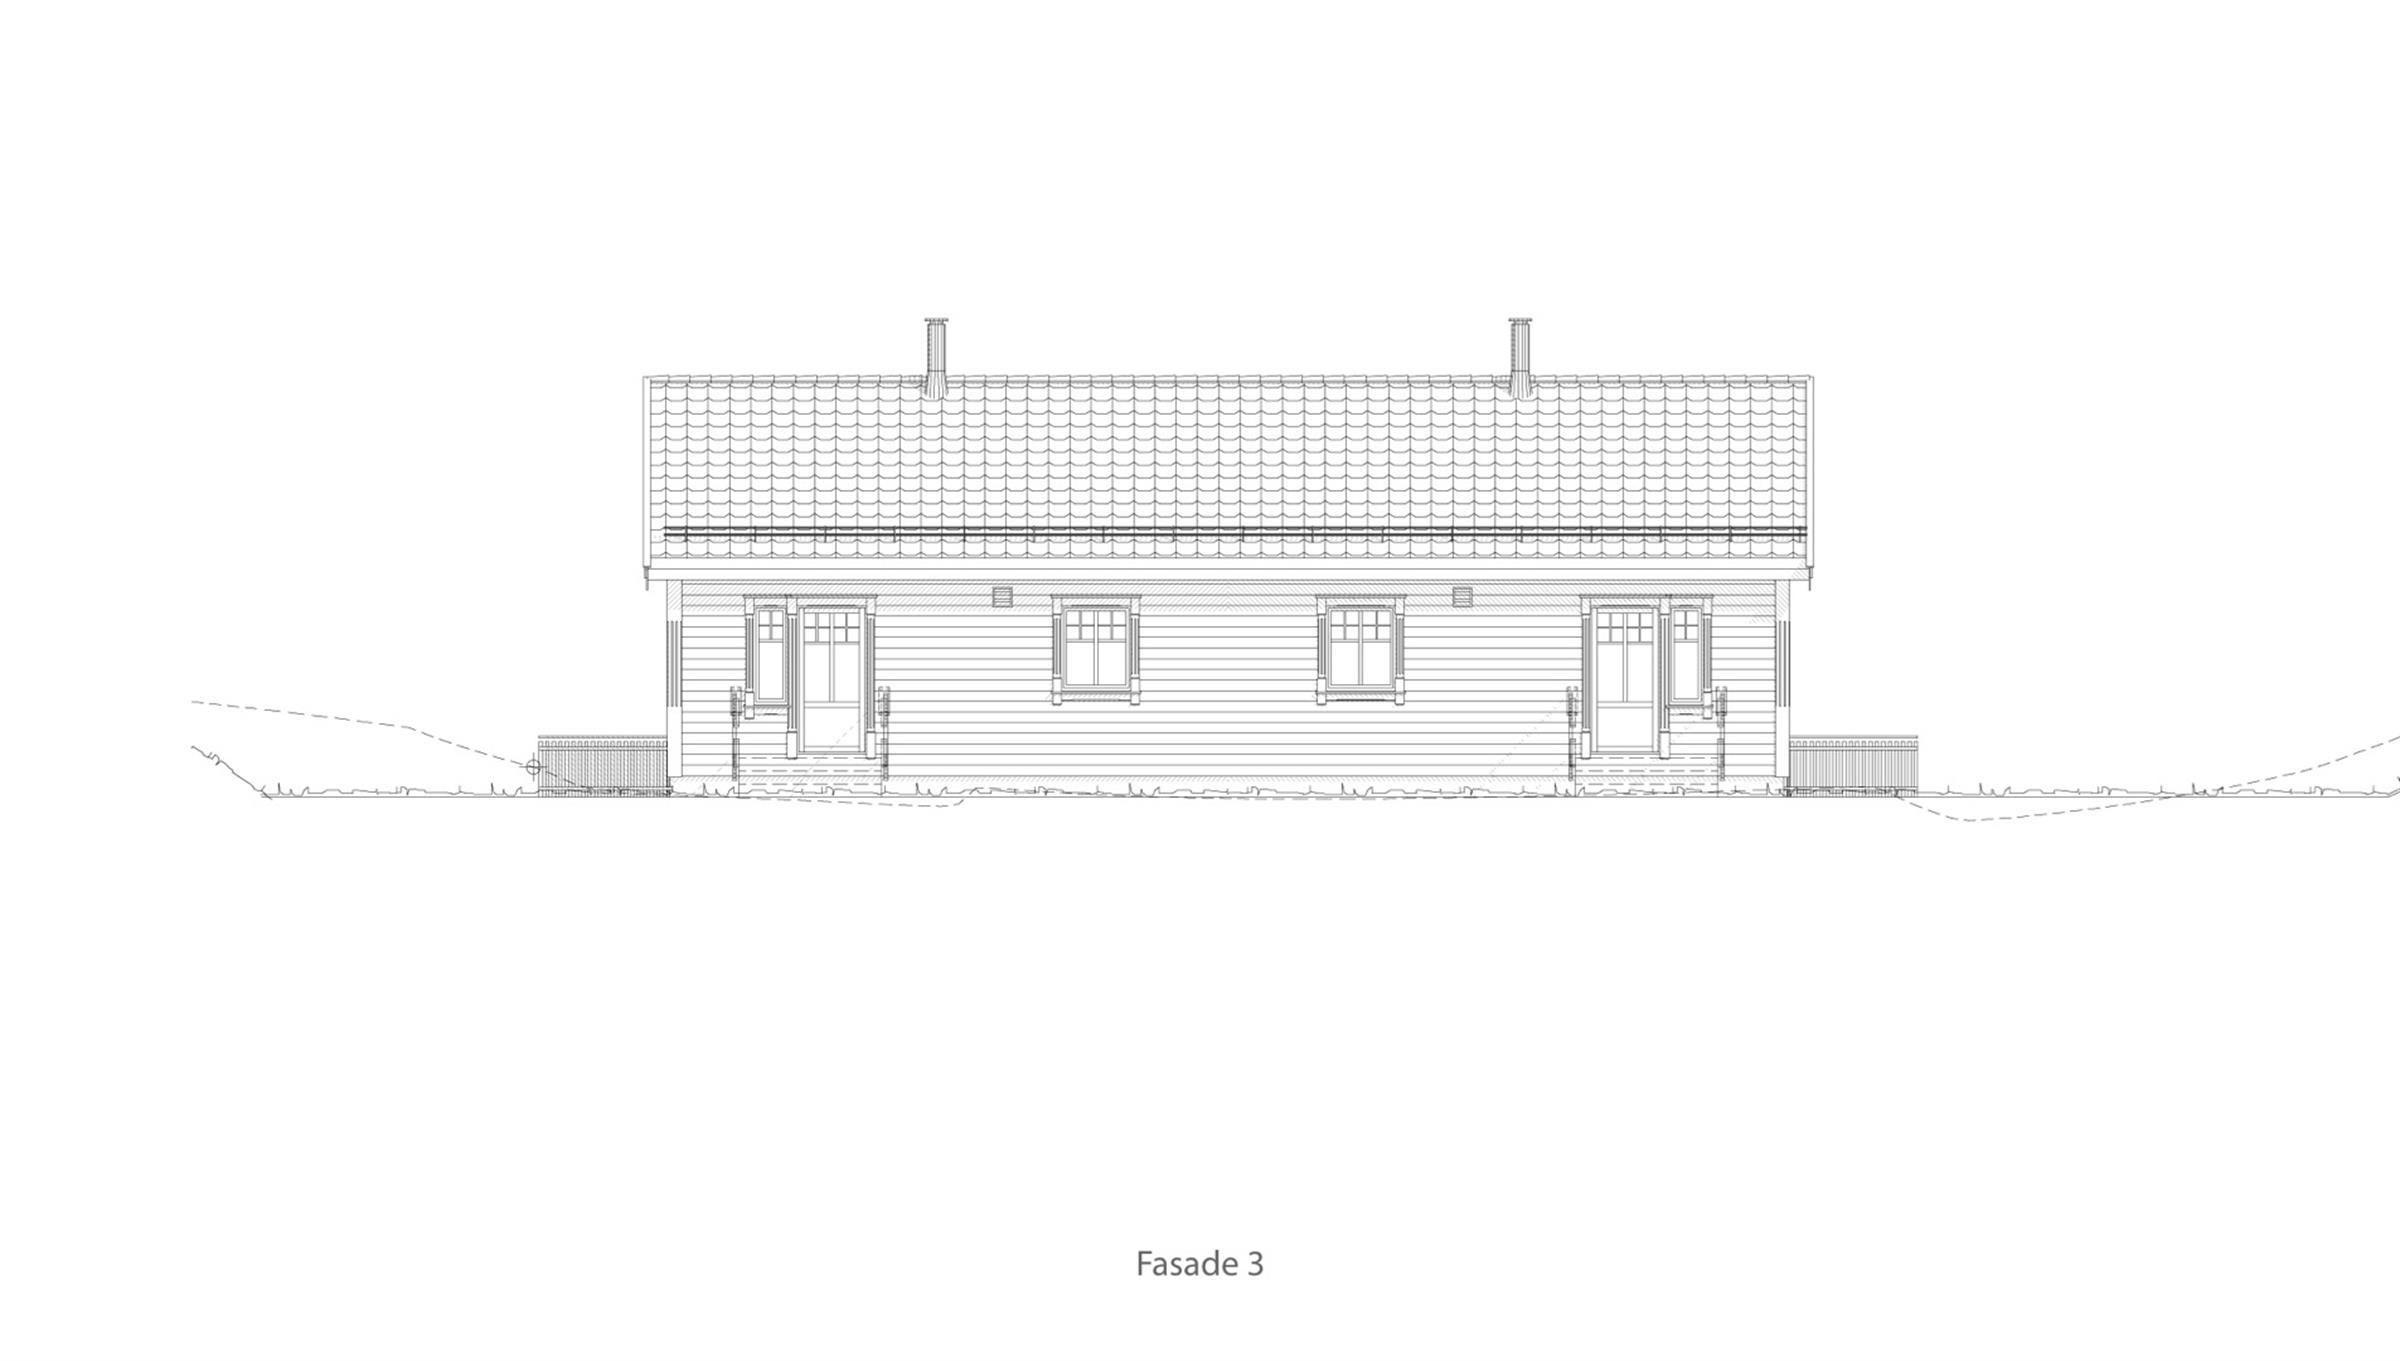 Alta fasade 3